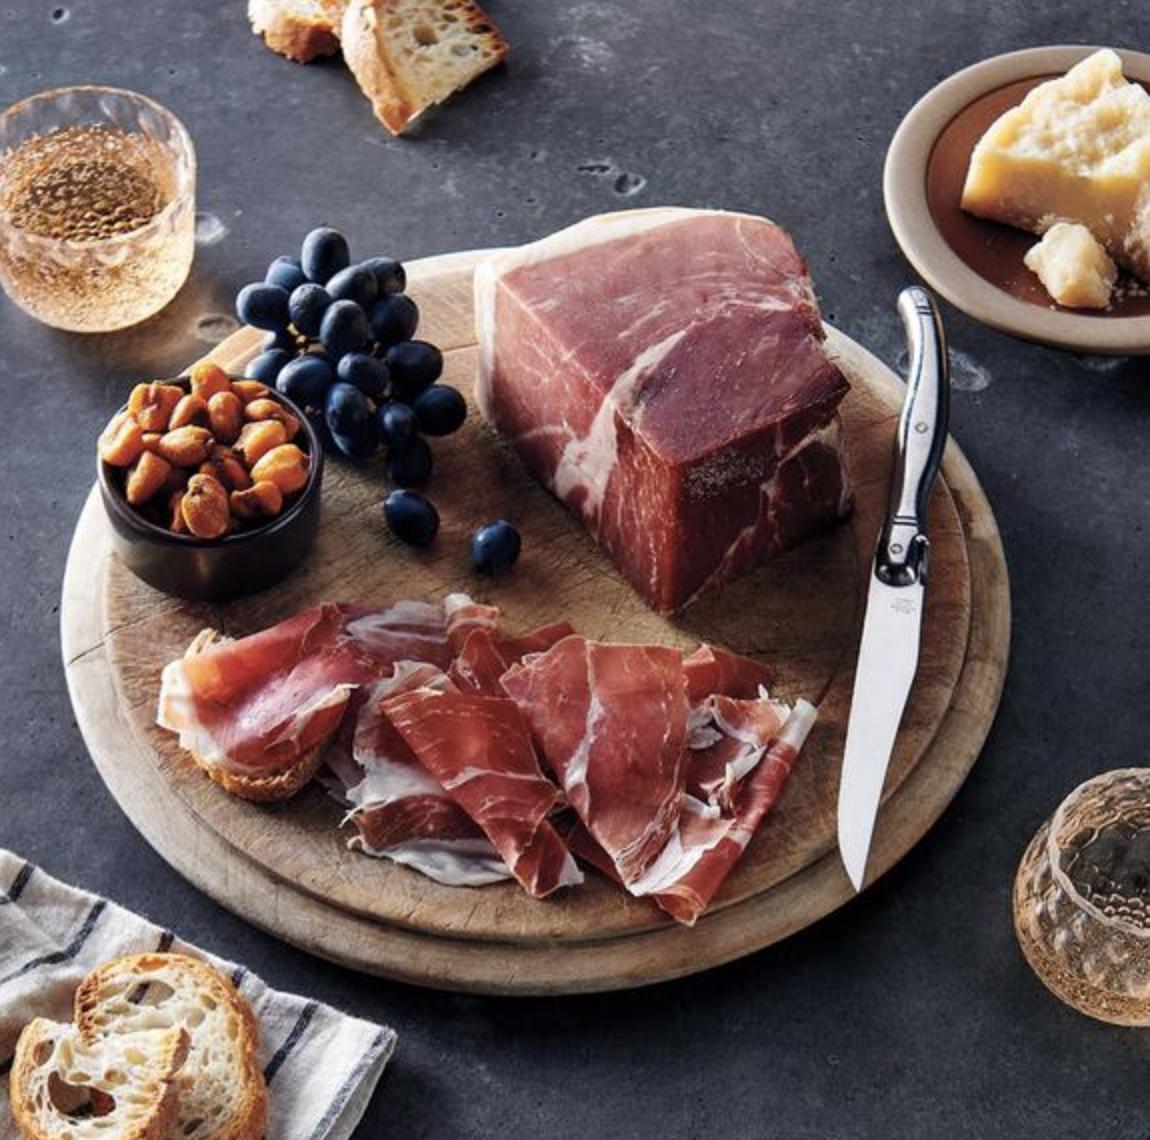 saxelby cheese ham